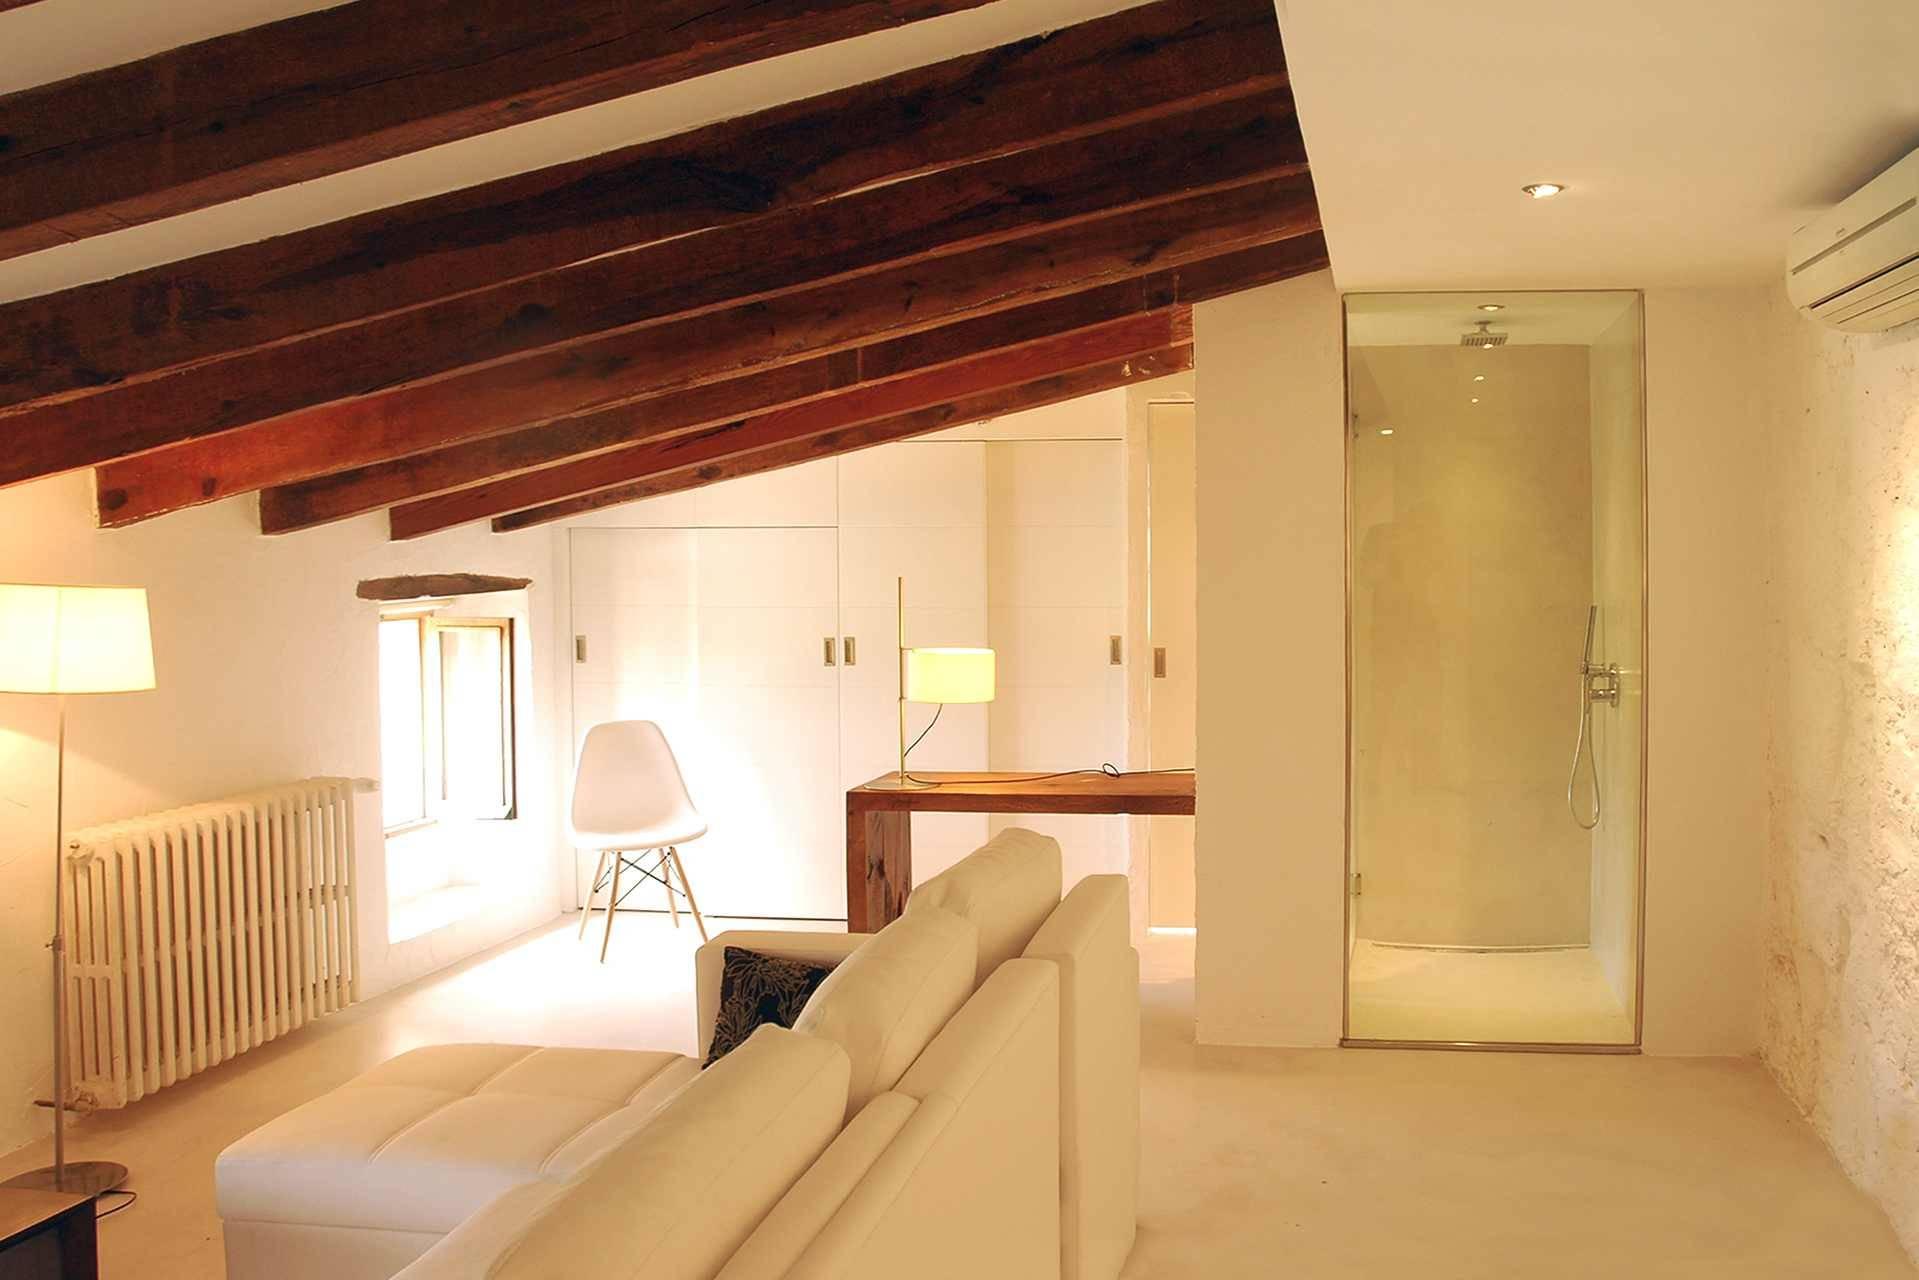 01-06 Charming Holiday Home Mallorca north Bild 28